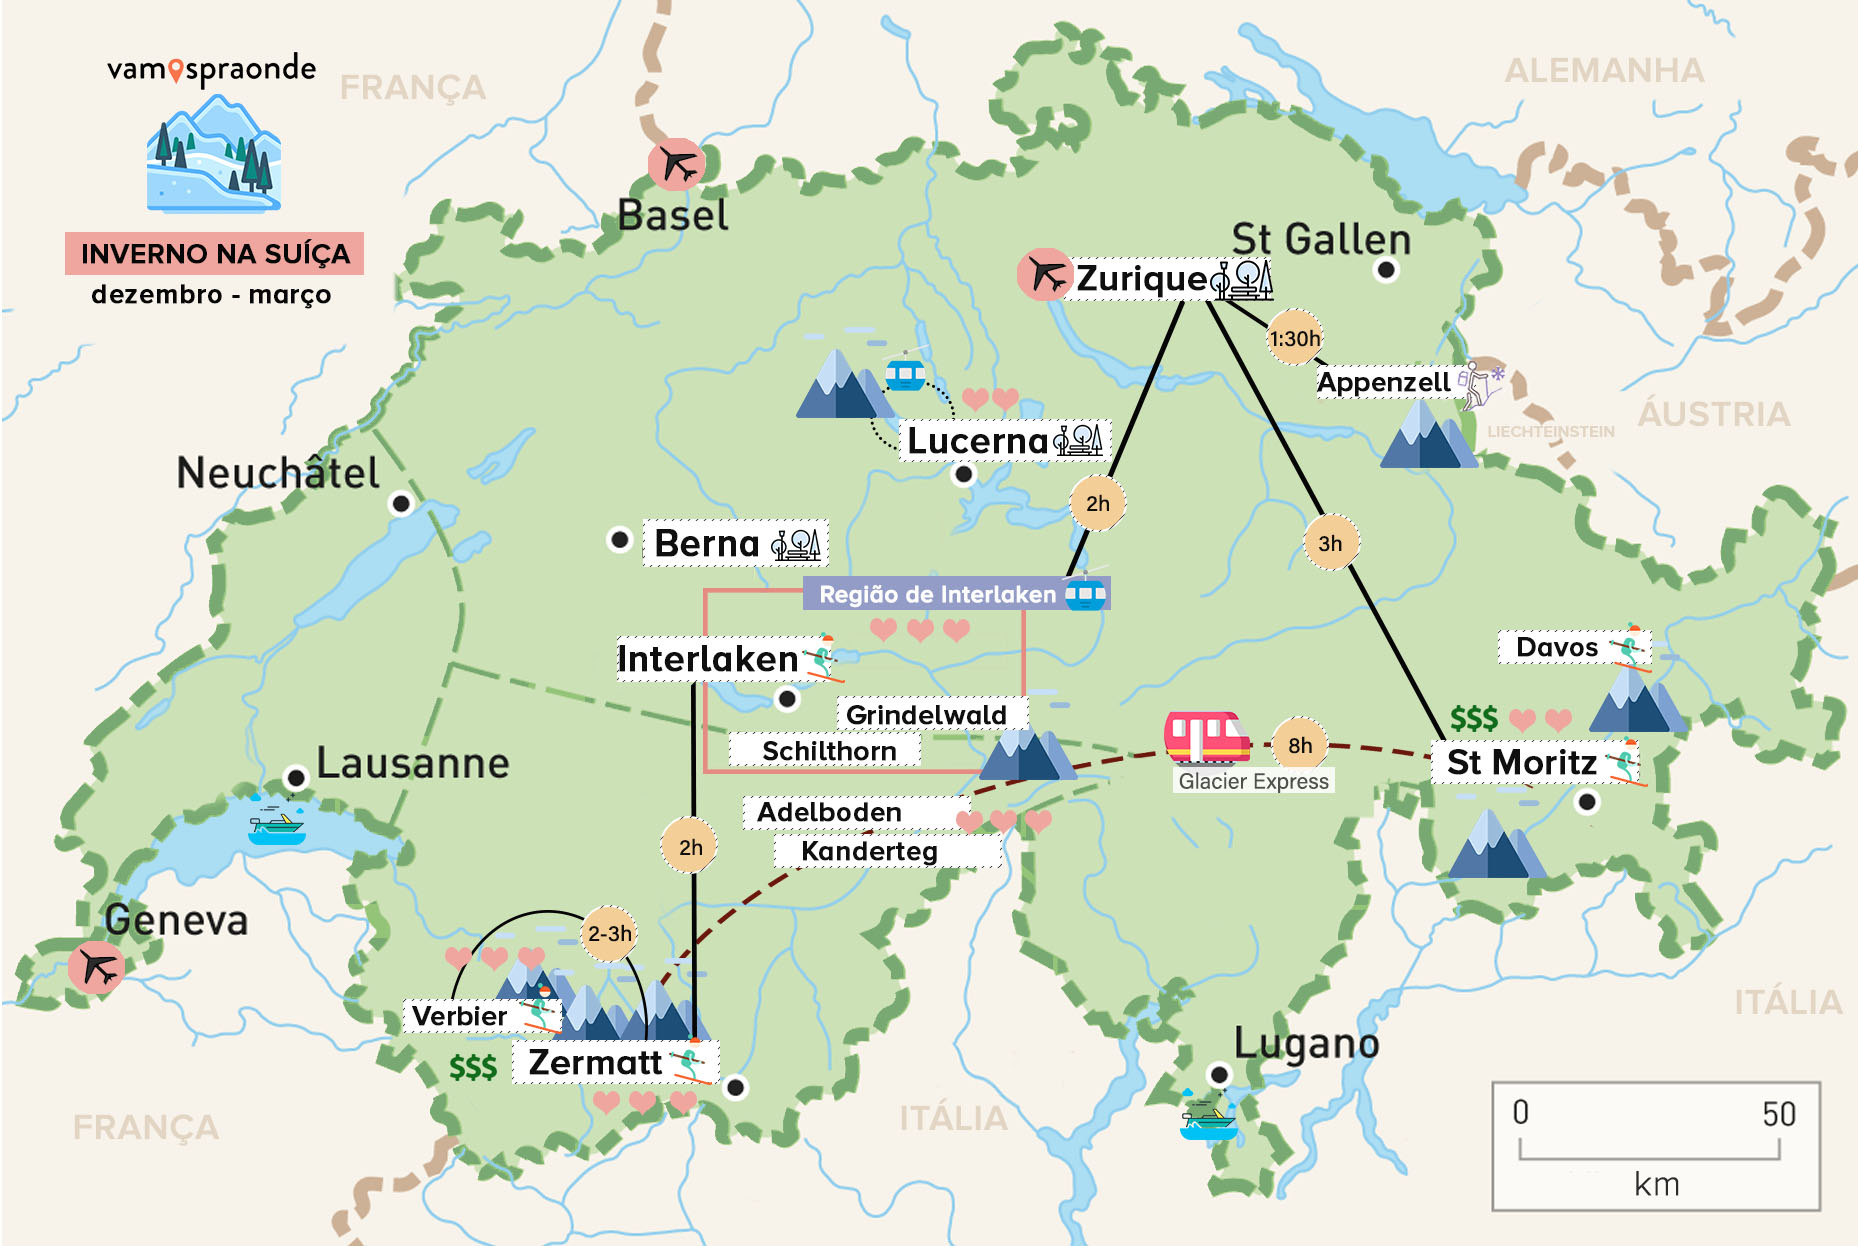 mapa indicando roteiro de inverno na suíça